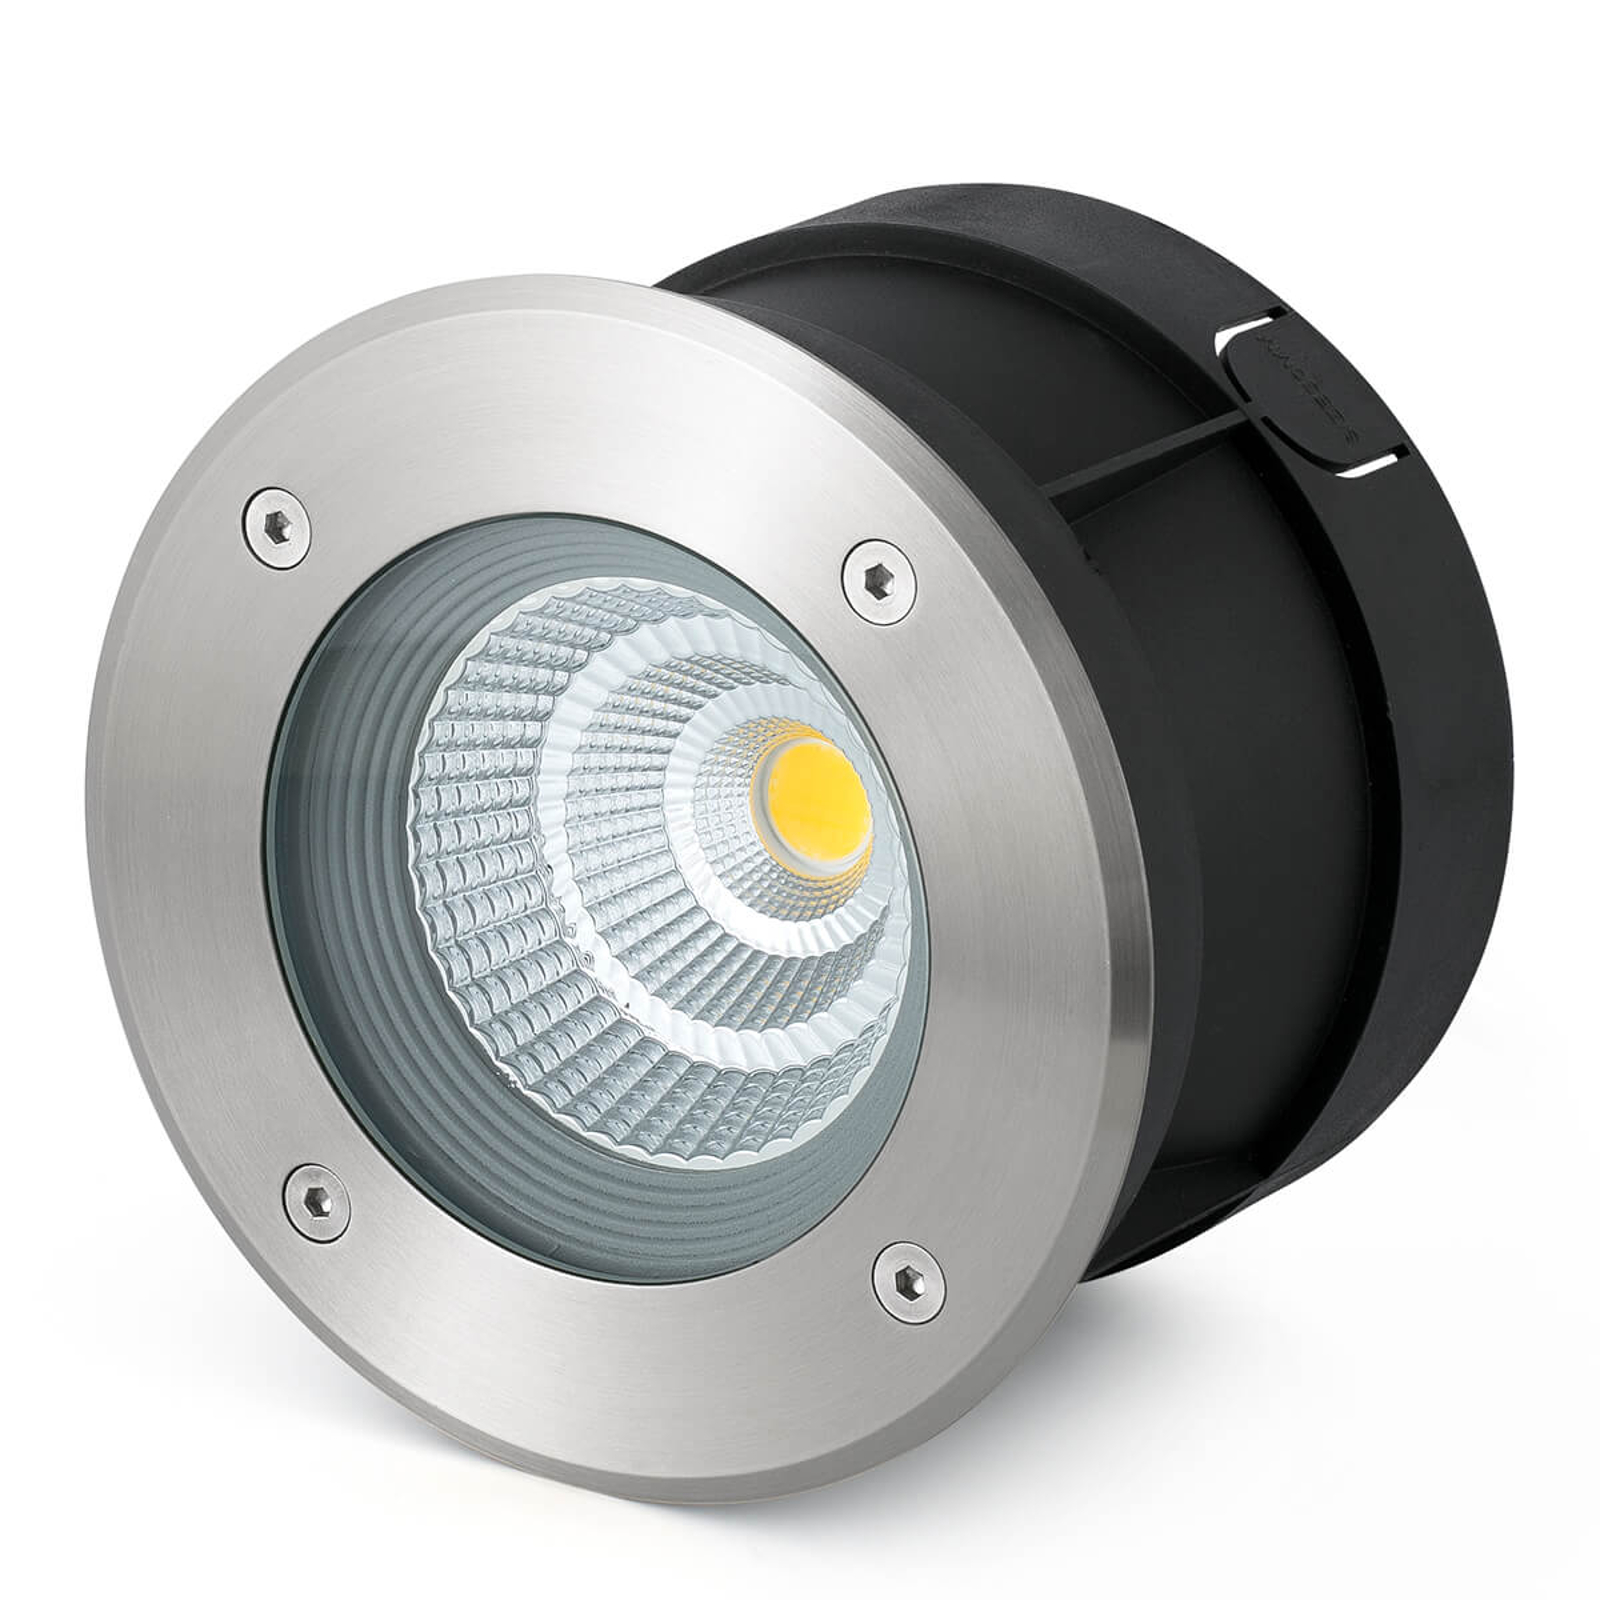 LED-uppovalo Suria-12, 24° säteilykulma